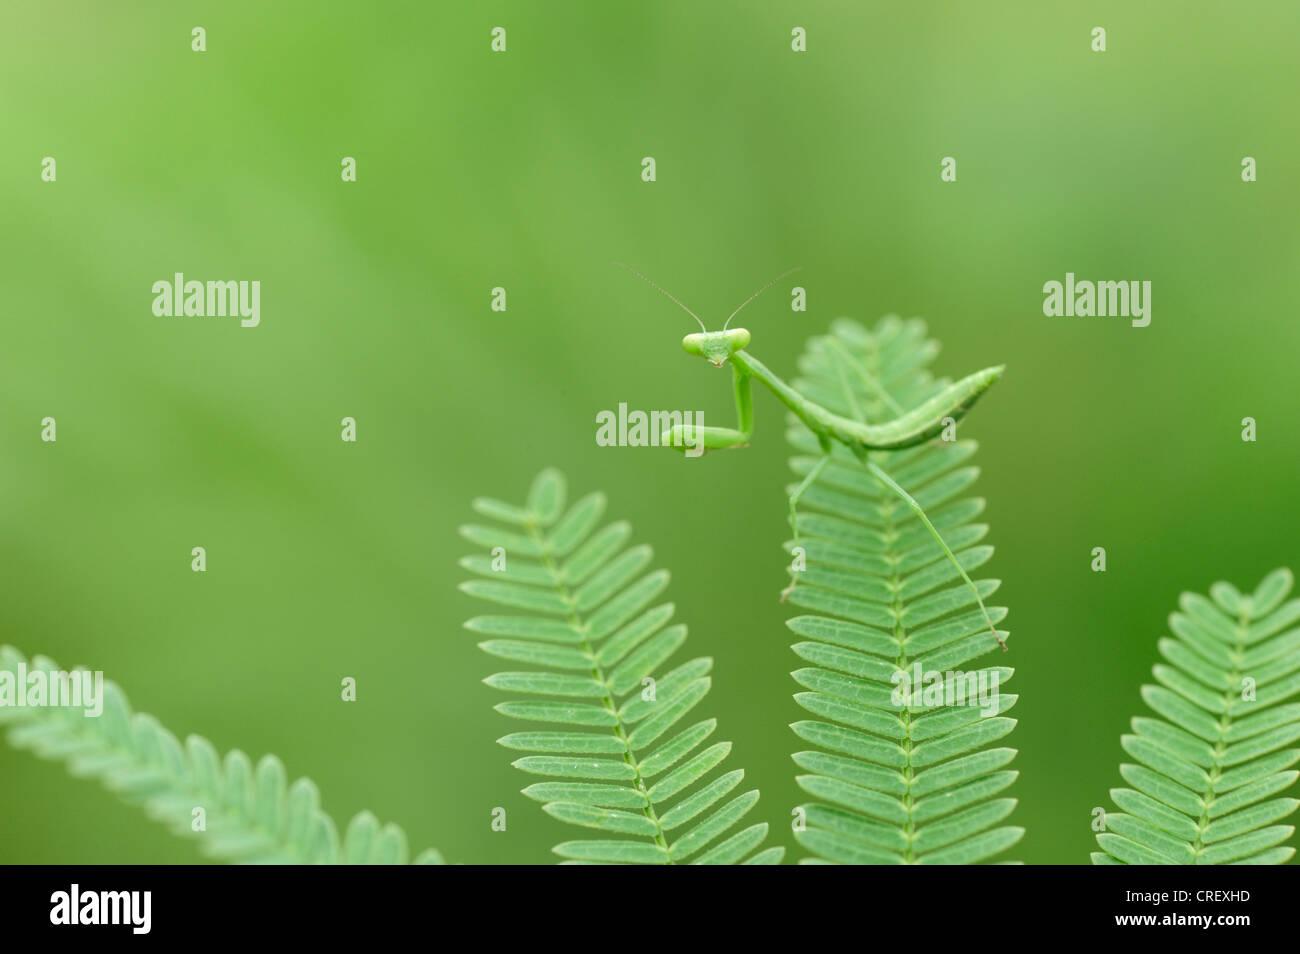 Praying Mantis (Mantis sp.), young camouflaged, Dinero, Lake Corpus Christi, South Texas, USA - Stock Image